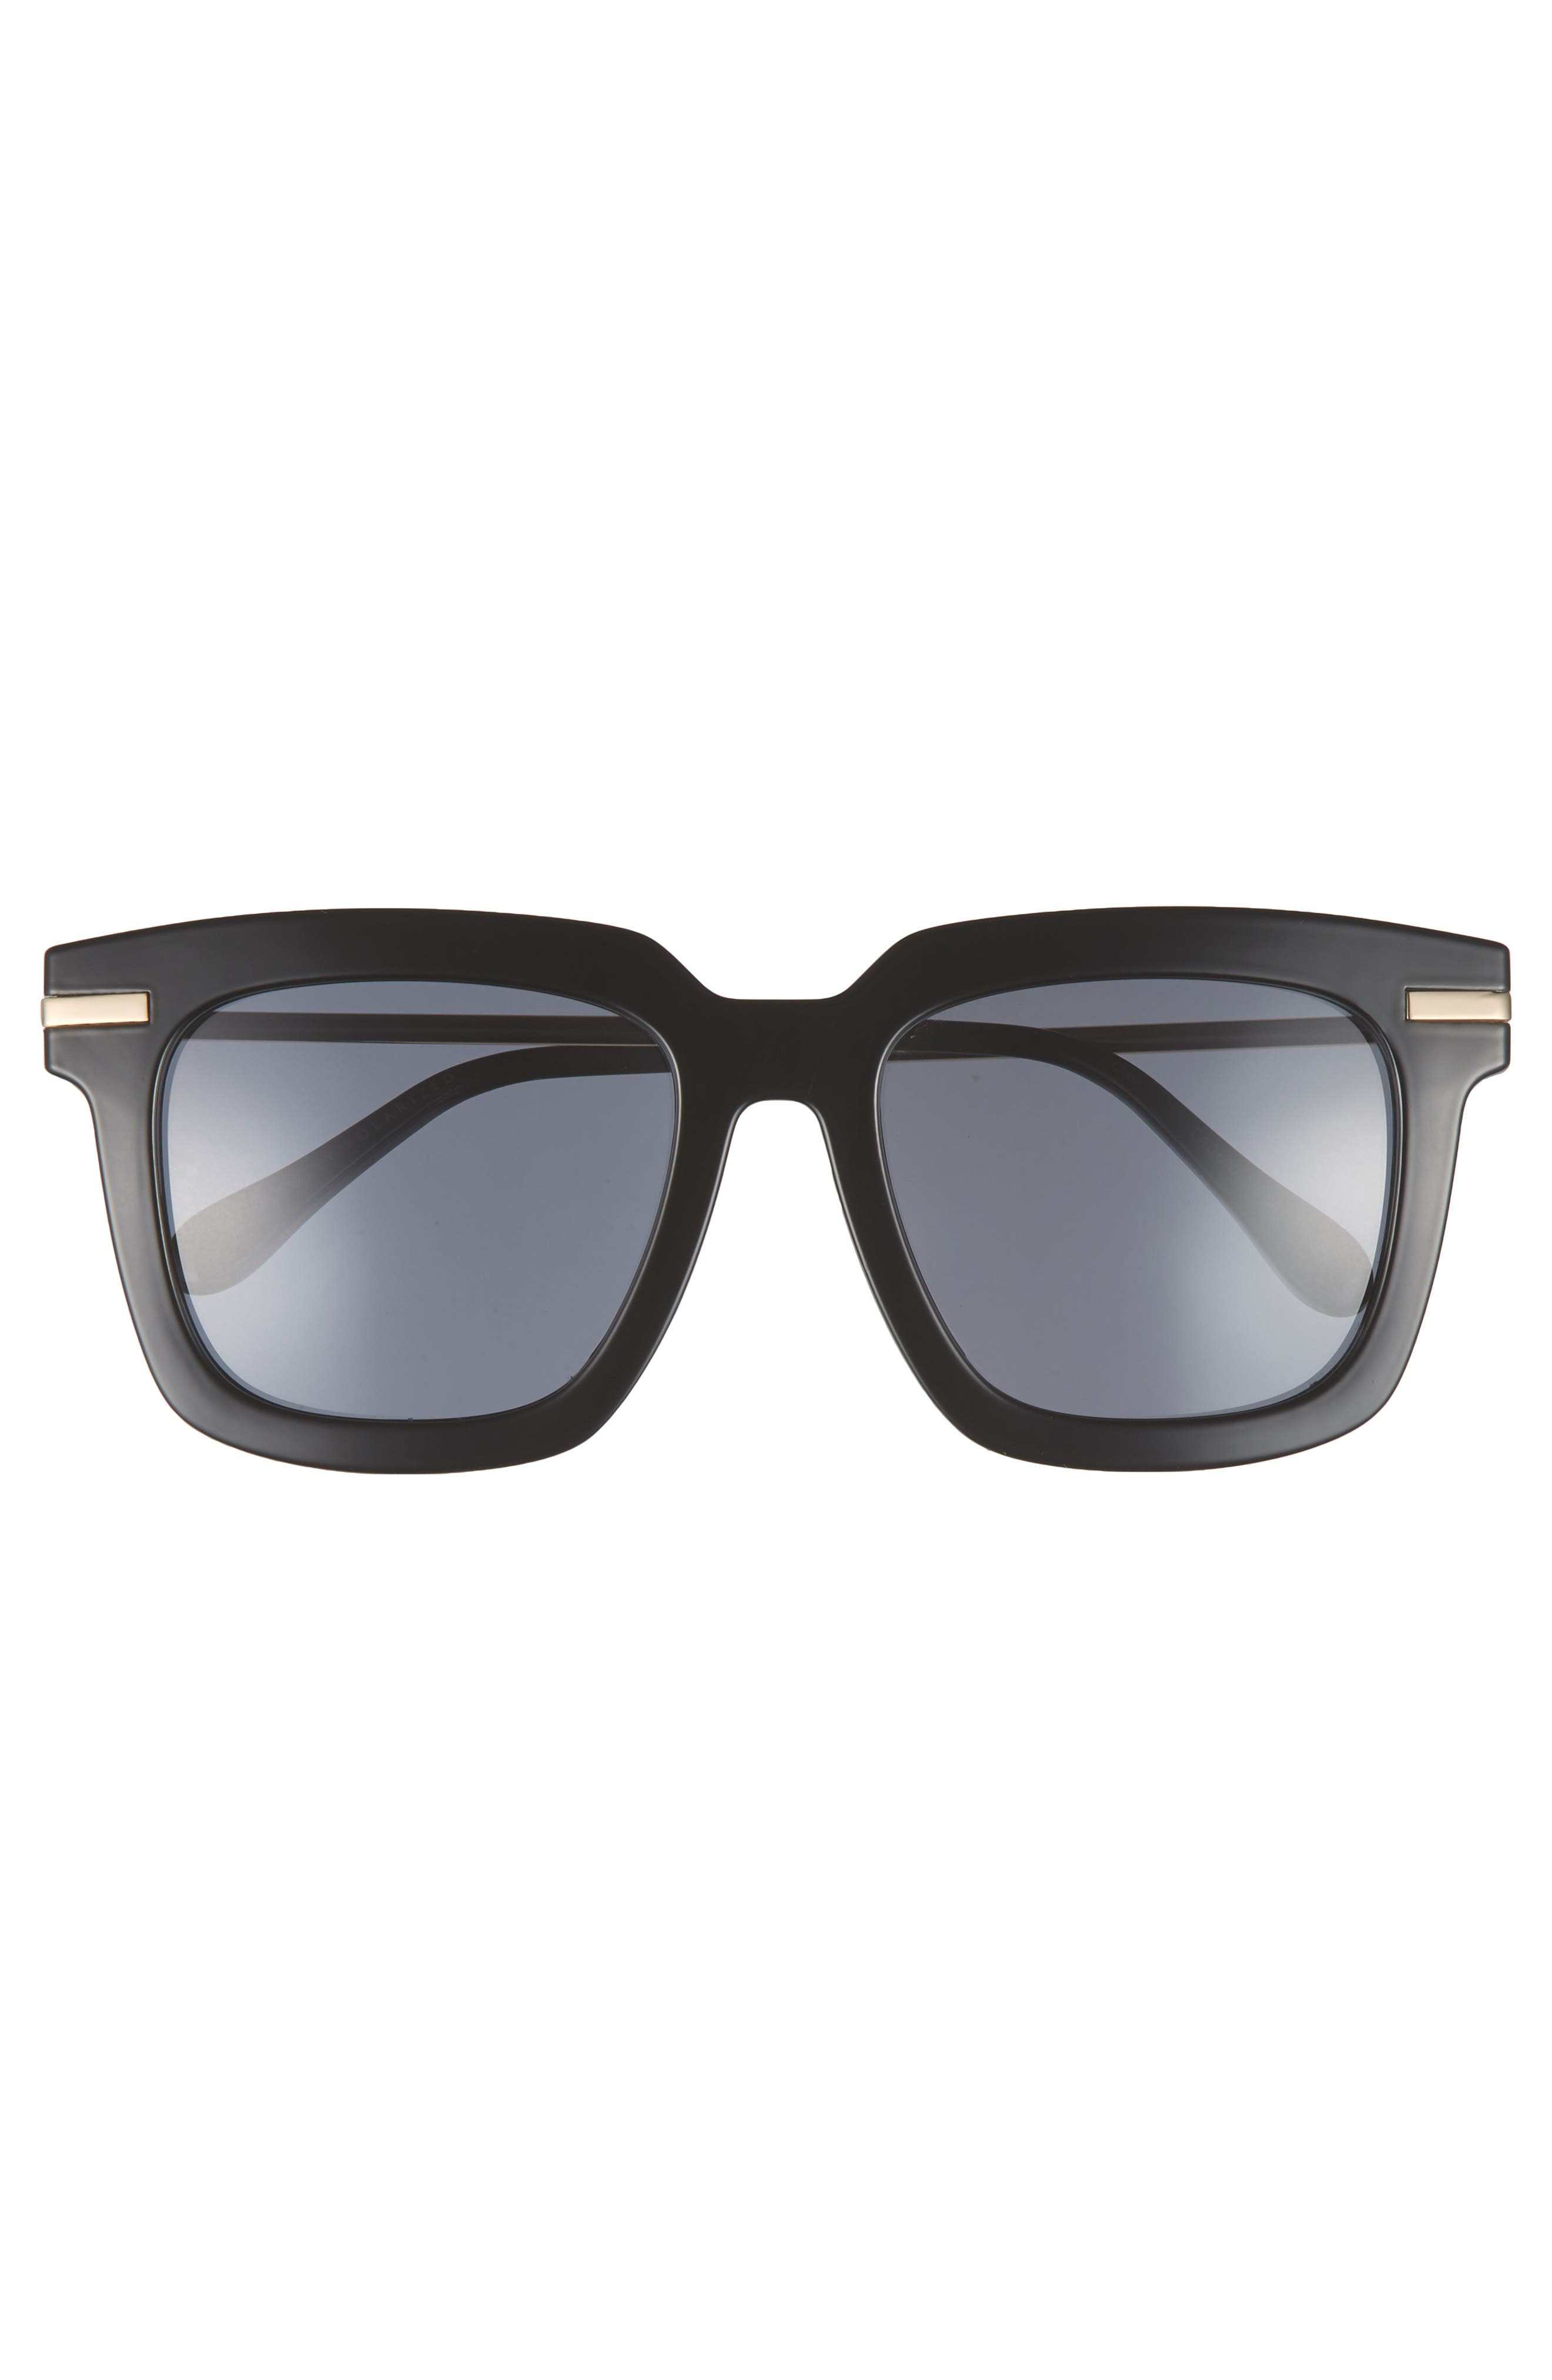 Laguna 51mm Polarized Sunglasses,                             Alternate thumbnail 3, color,                             001